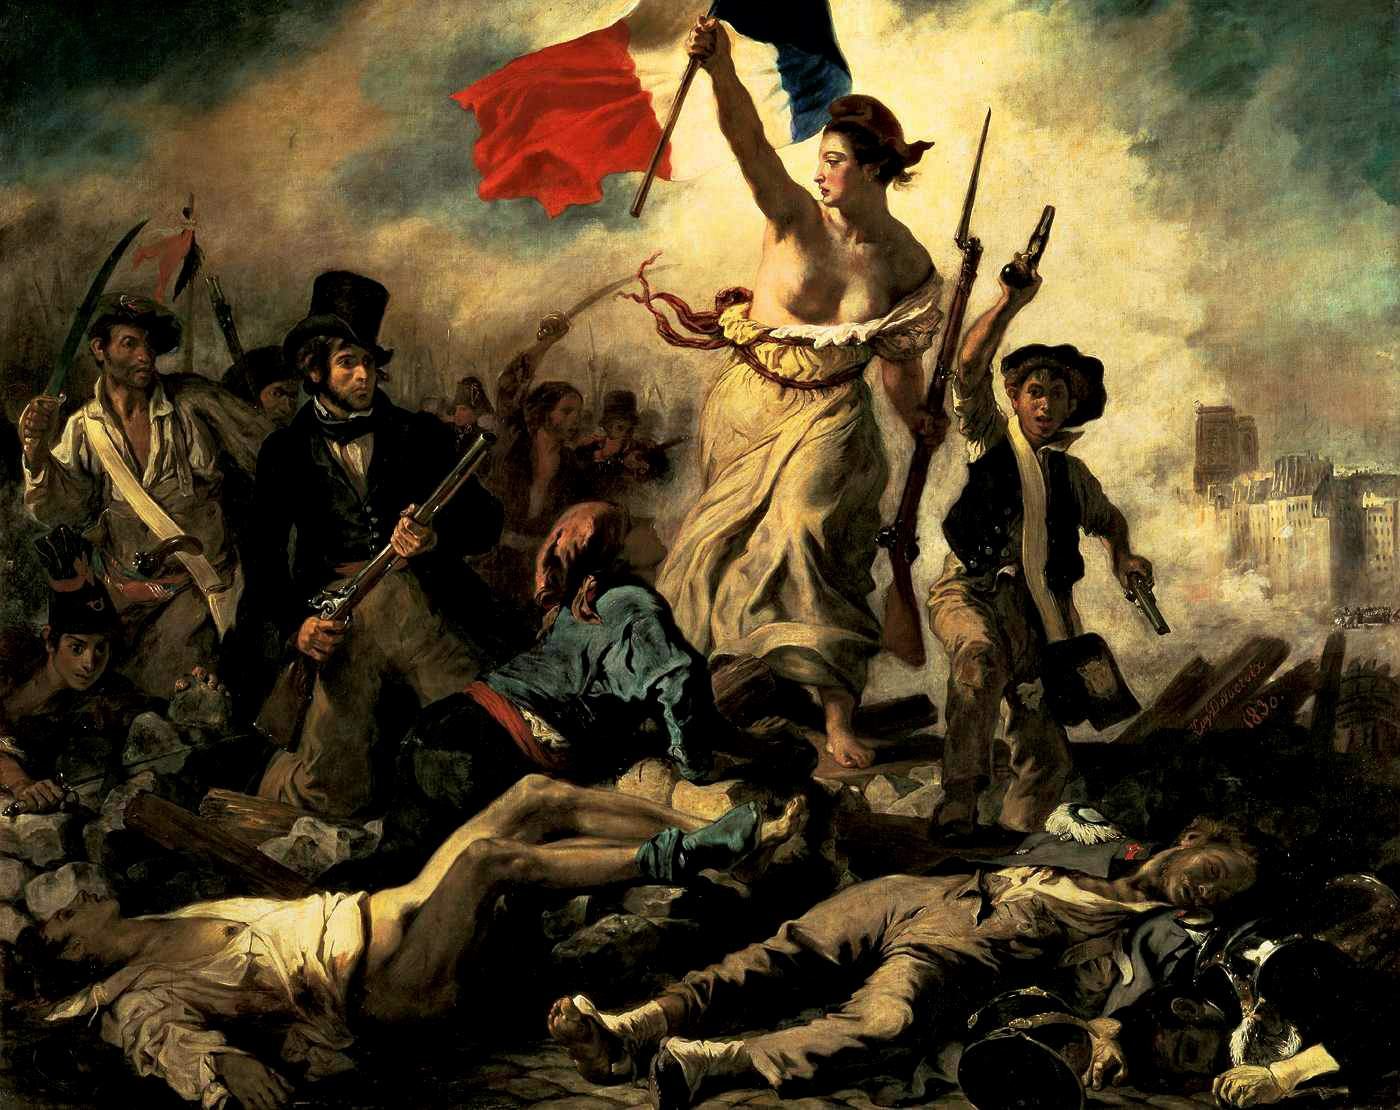 http://upload.wikimedia.org/wikipedia/commons/archive/a/a7/20090420054352!Eug%C3%A8ne_Delacroix_-_La_libert%C3%A9_guidant_le_peuple.jpg